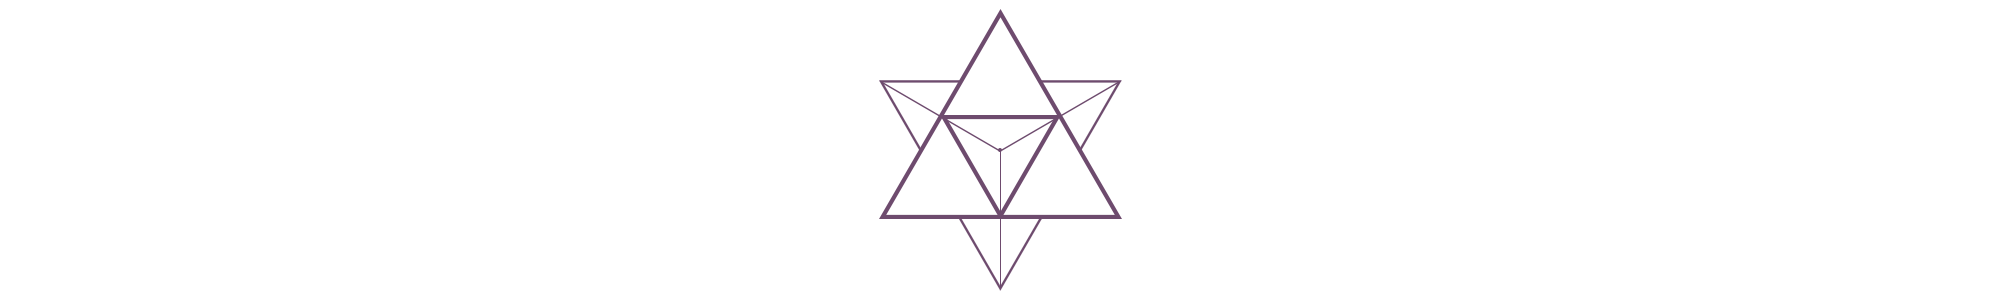 Website Marakaba dk purple.png